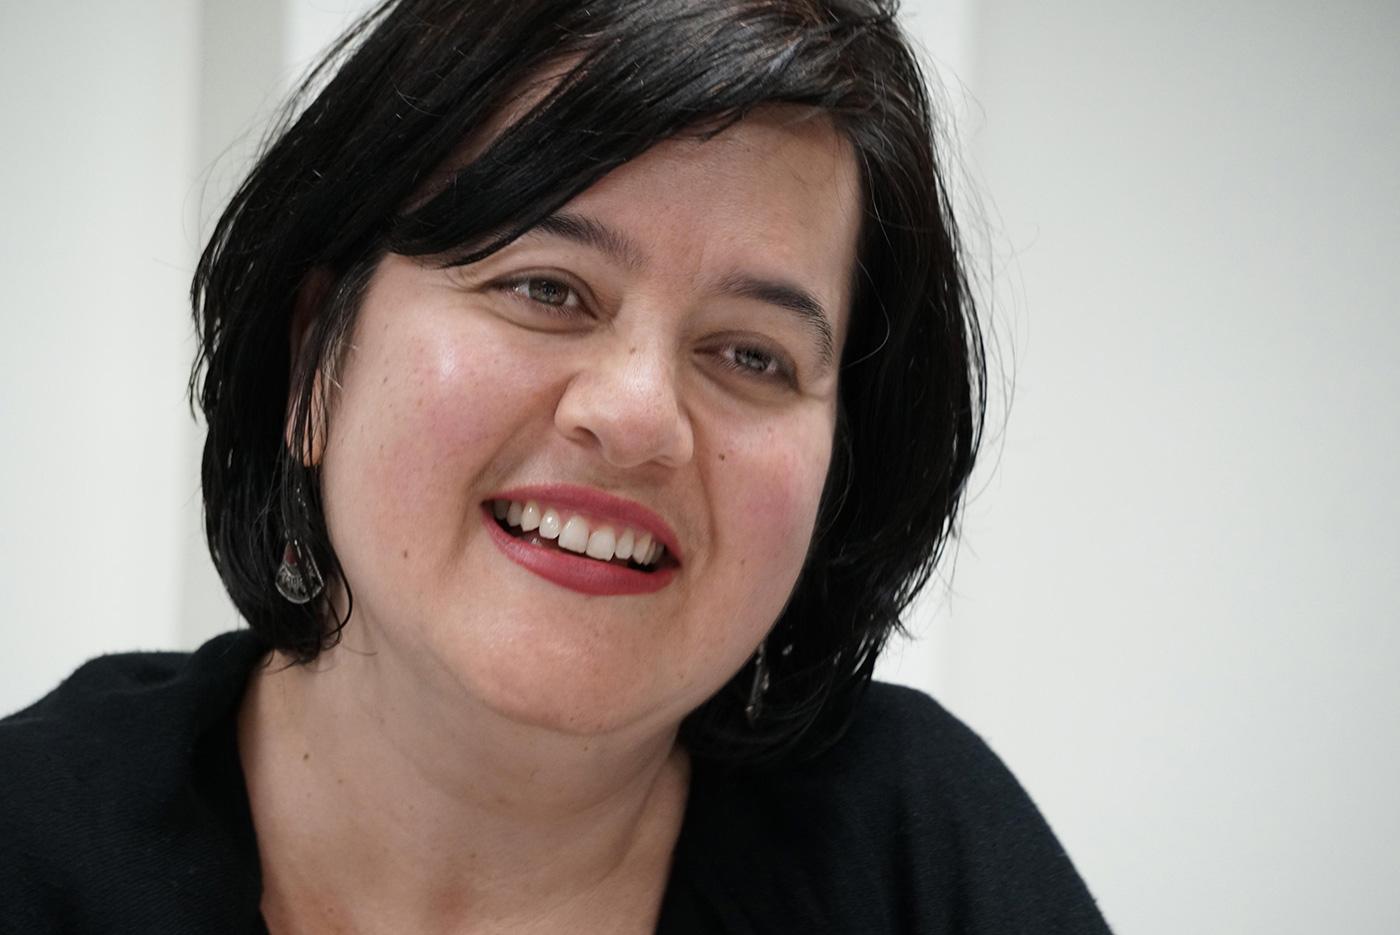 Marielena Hincapié